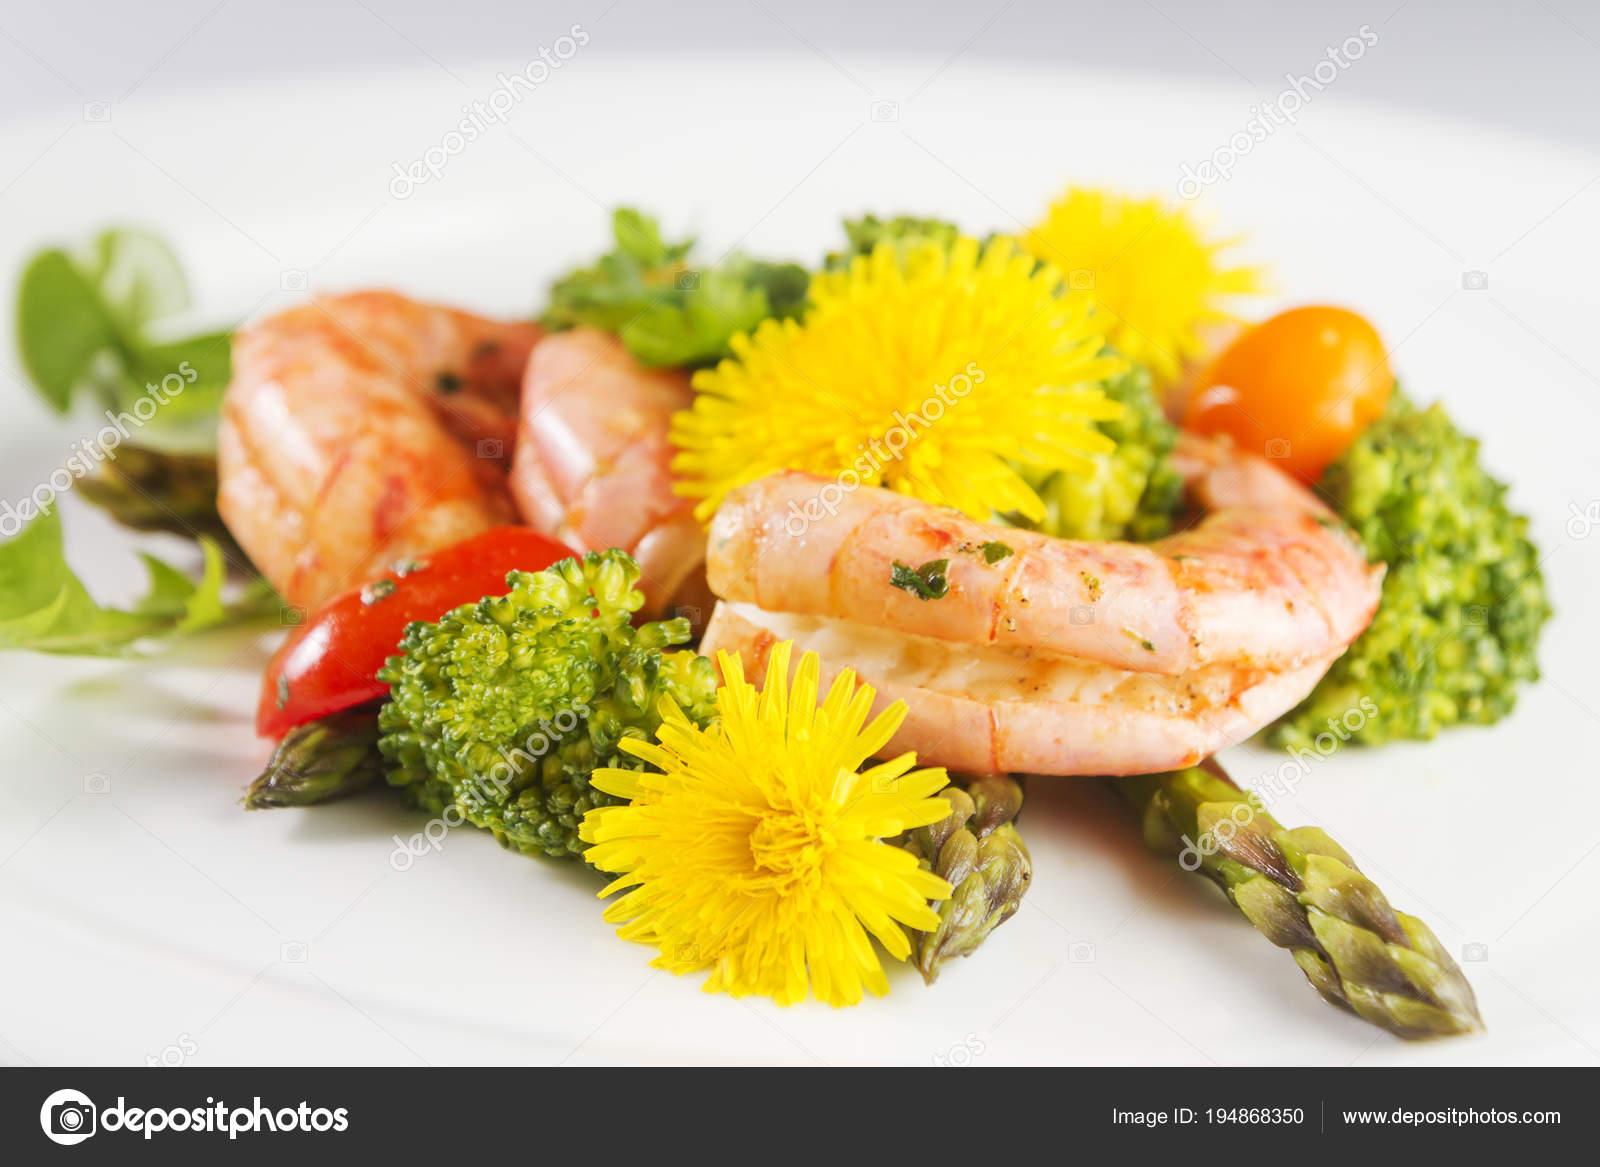 Prawns Asparagus Broccoli Edible Dandelion Flowers Selective Focus